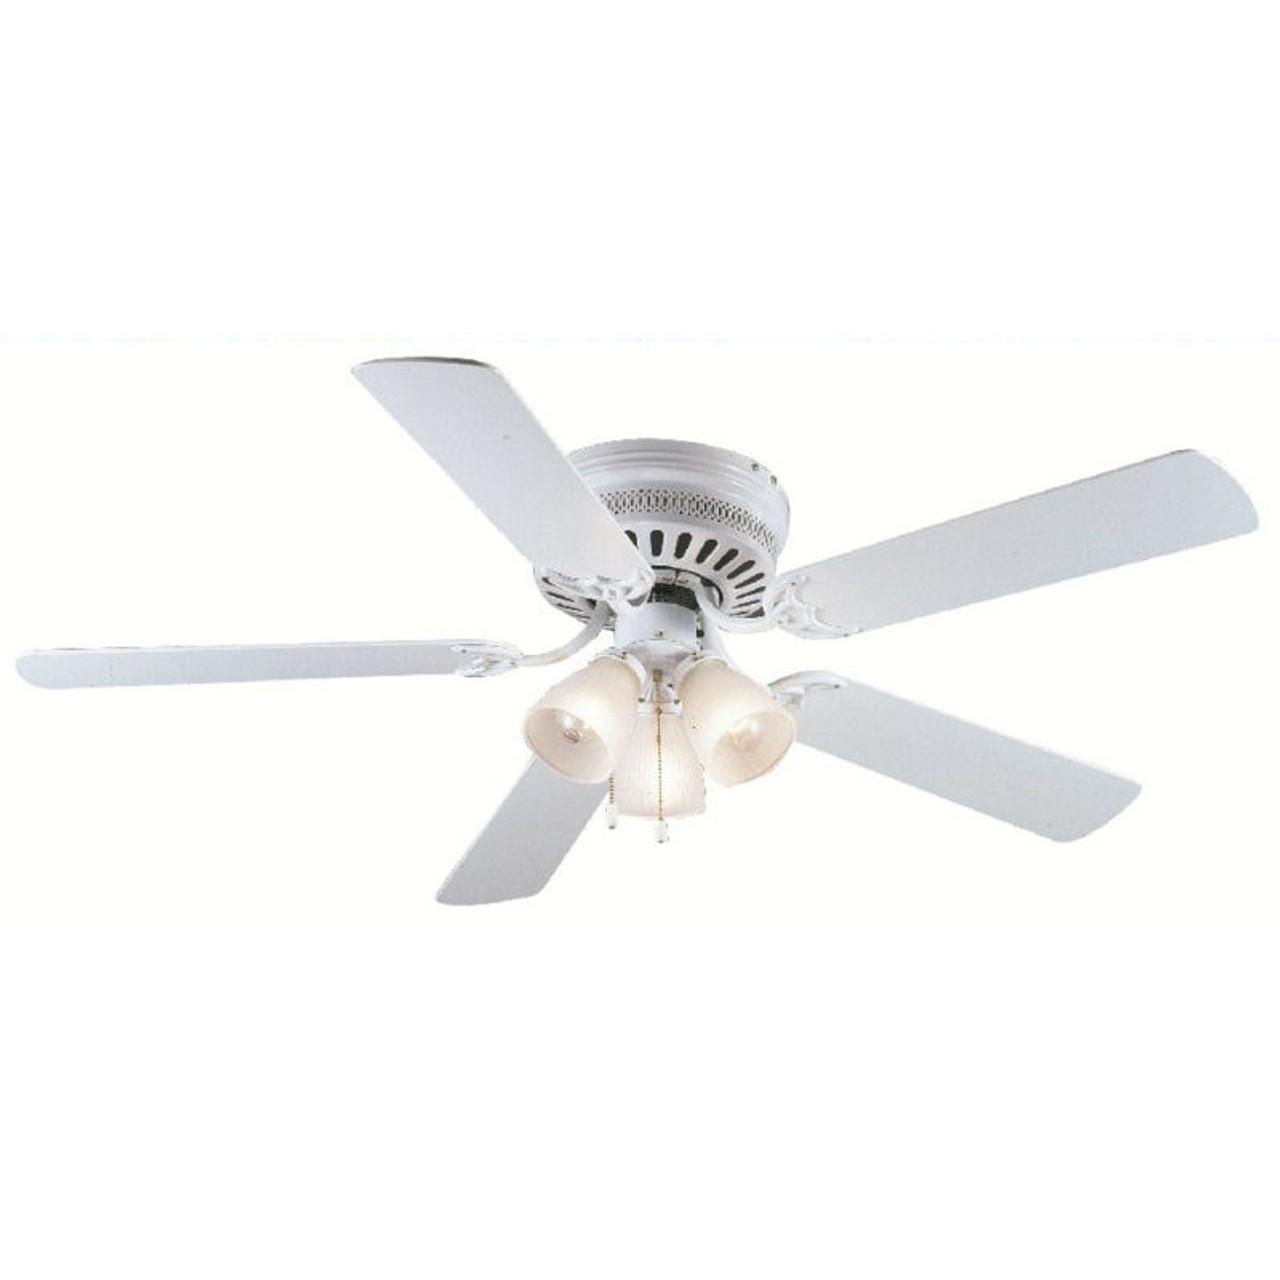 Image of: White 52 Hugger Ceiling Fan W Light Kit 5877 Discount Home Furnishings Inc